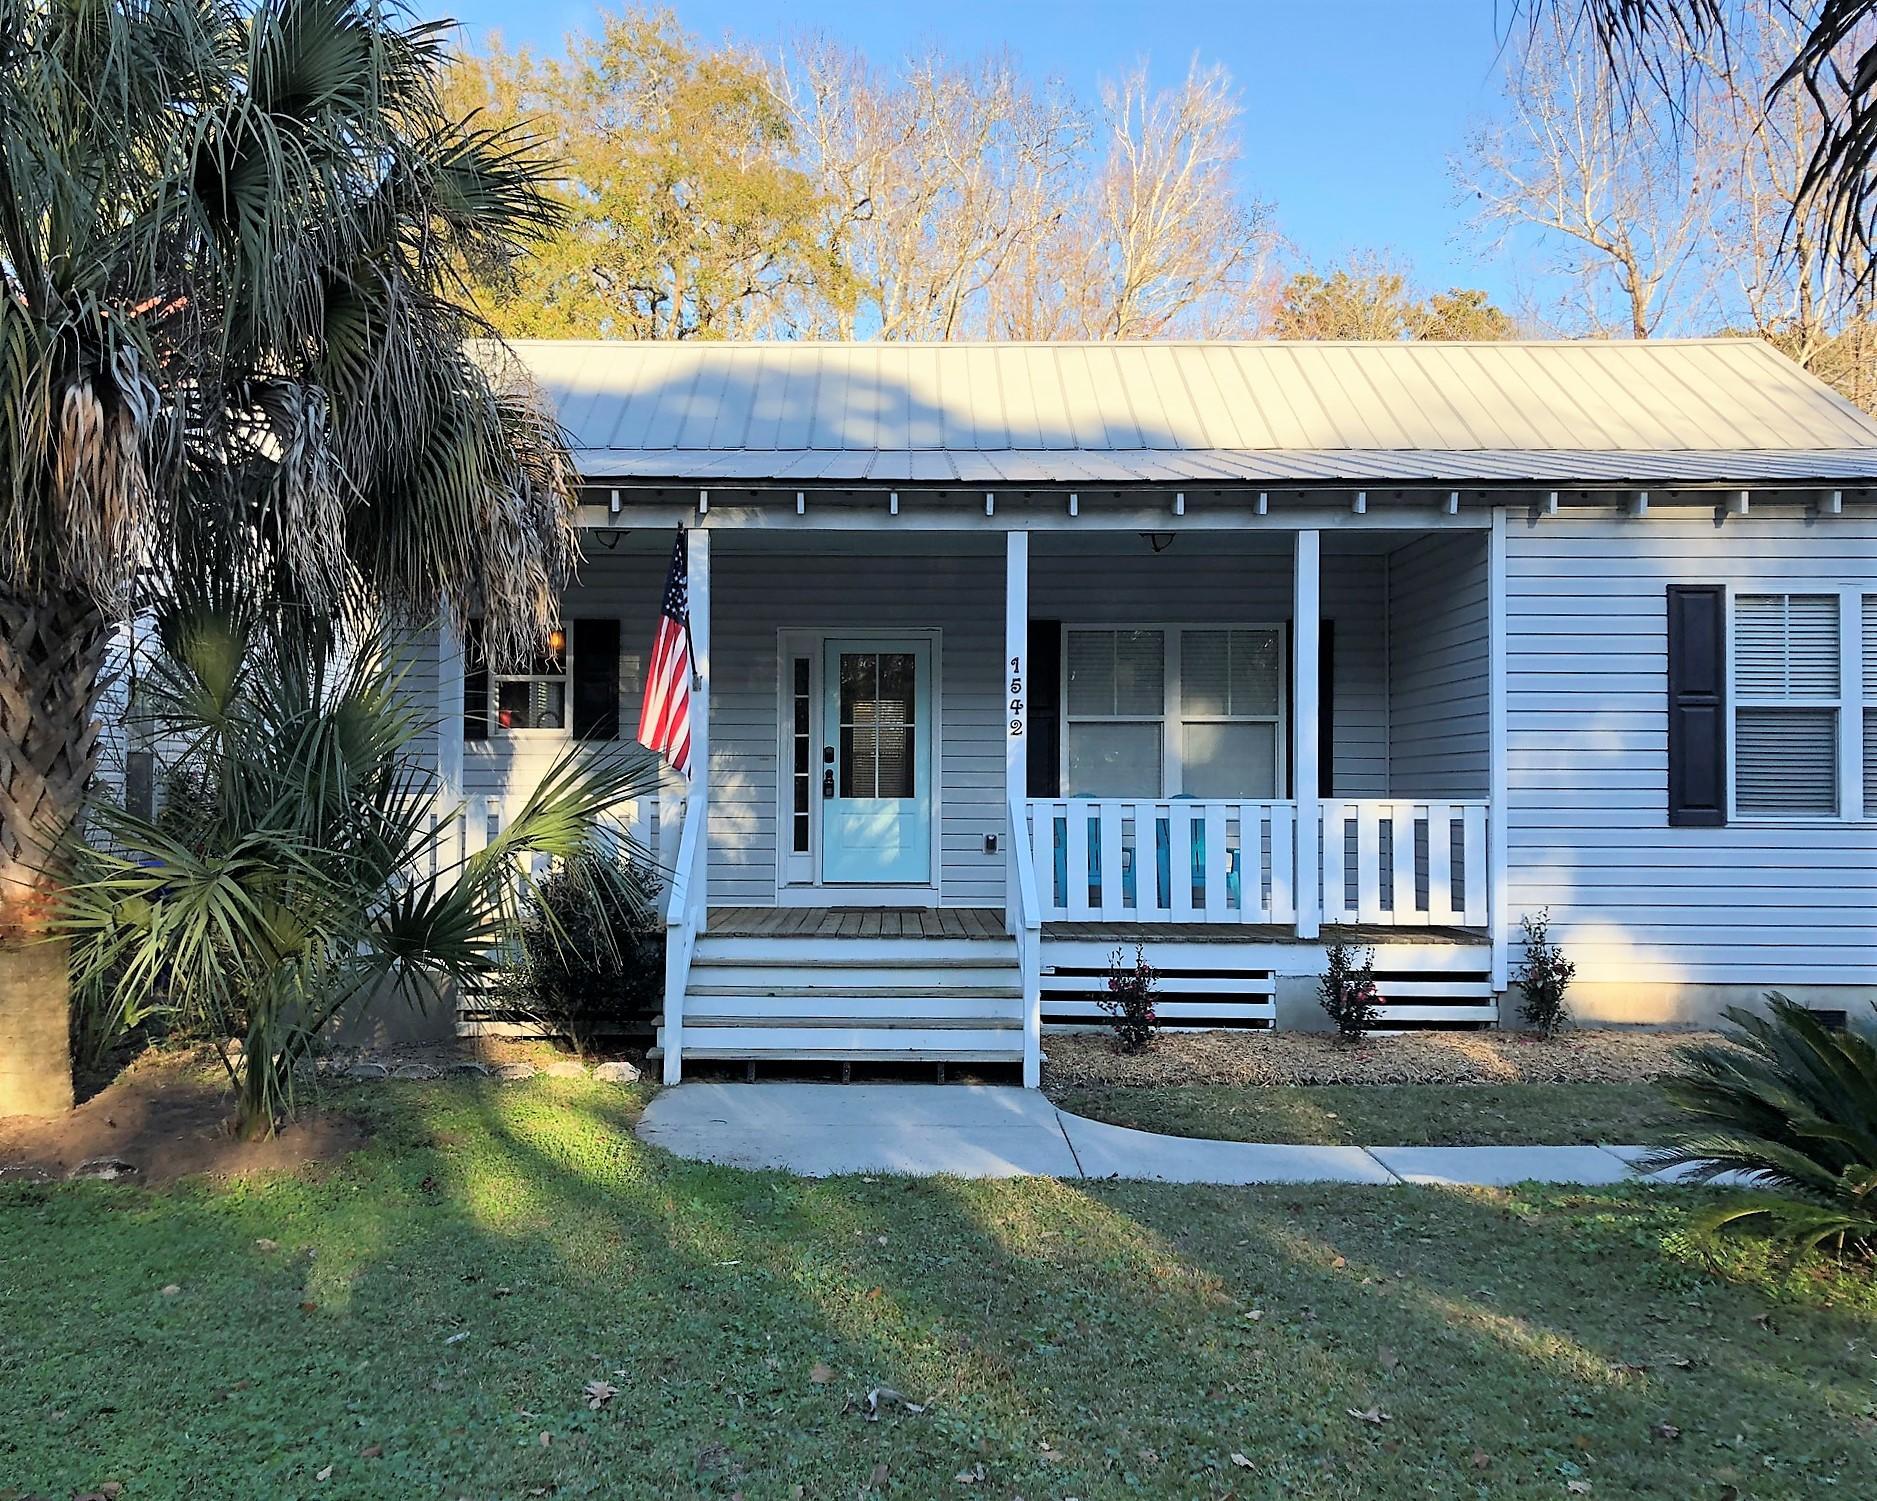 Fairway Villas Homes For Sale - 1542 Little Rock, Charleston, SC - 2